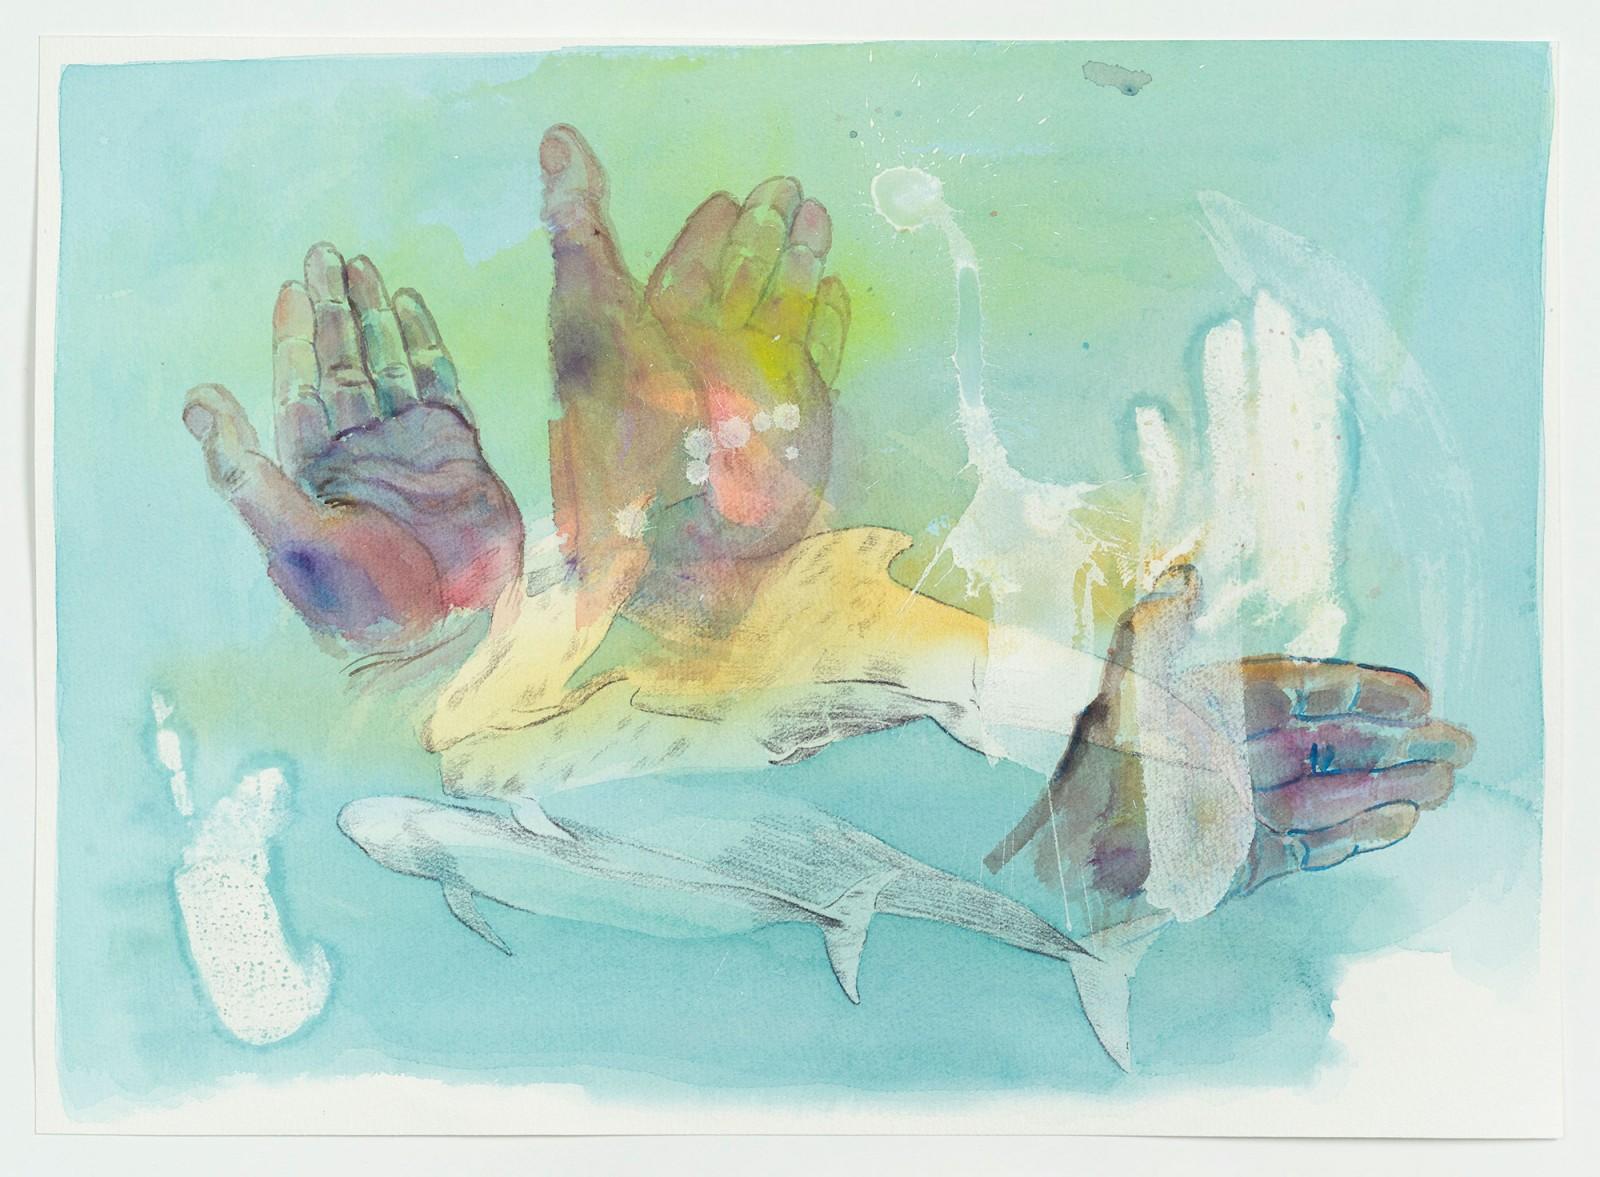 Kim Nekarda: untitled, 2020, watercolour, carbon & body print on paper, 41 x 57 cm